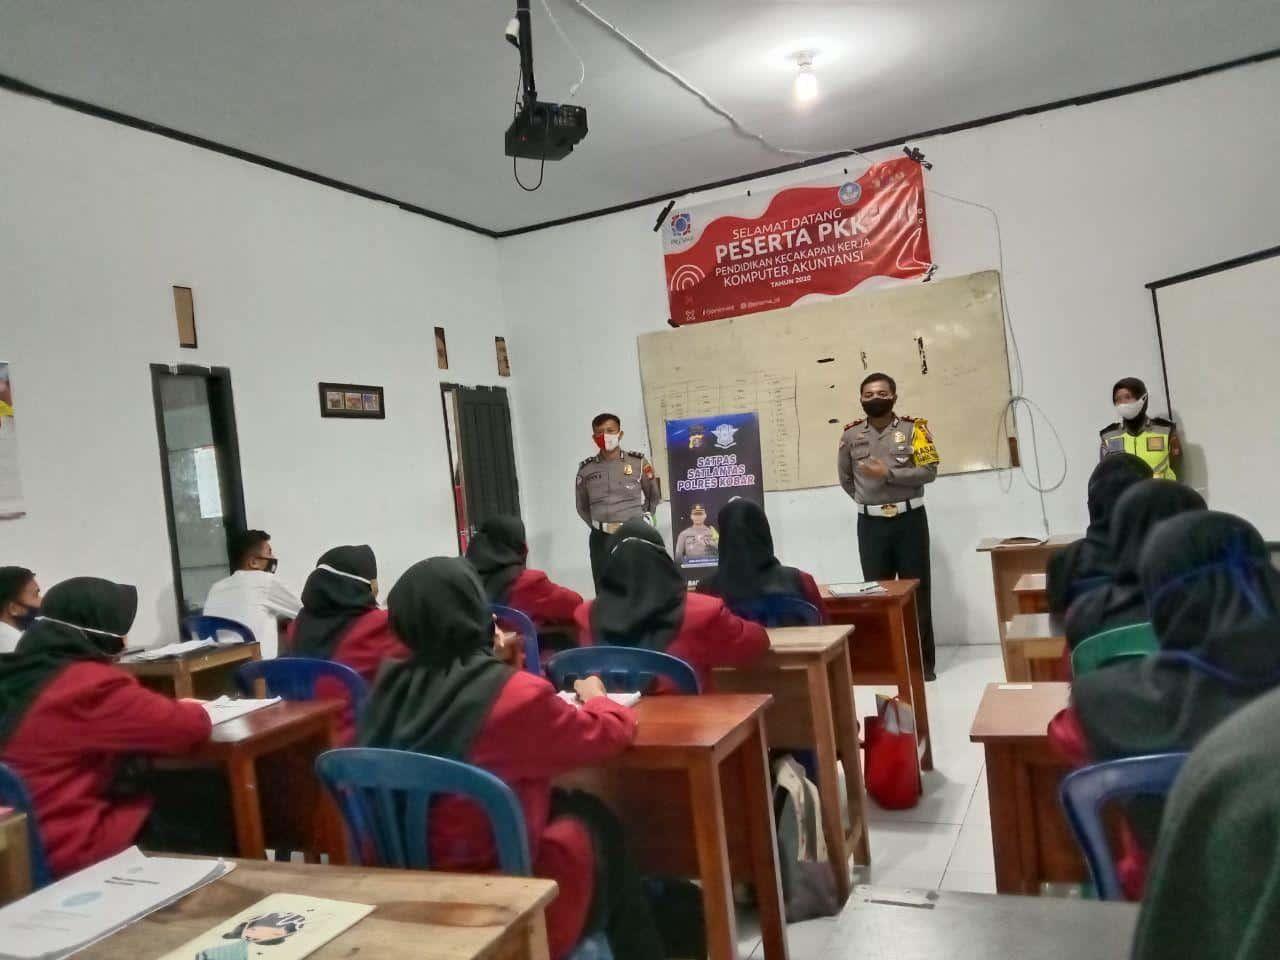 Tertib Berlalu Lintas, Peserta Didik LPK Prisma mendapat Sosialisasi dari Kasat Lantas Polres Kotawaringin Barat